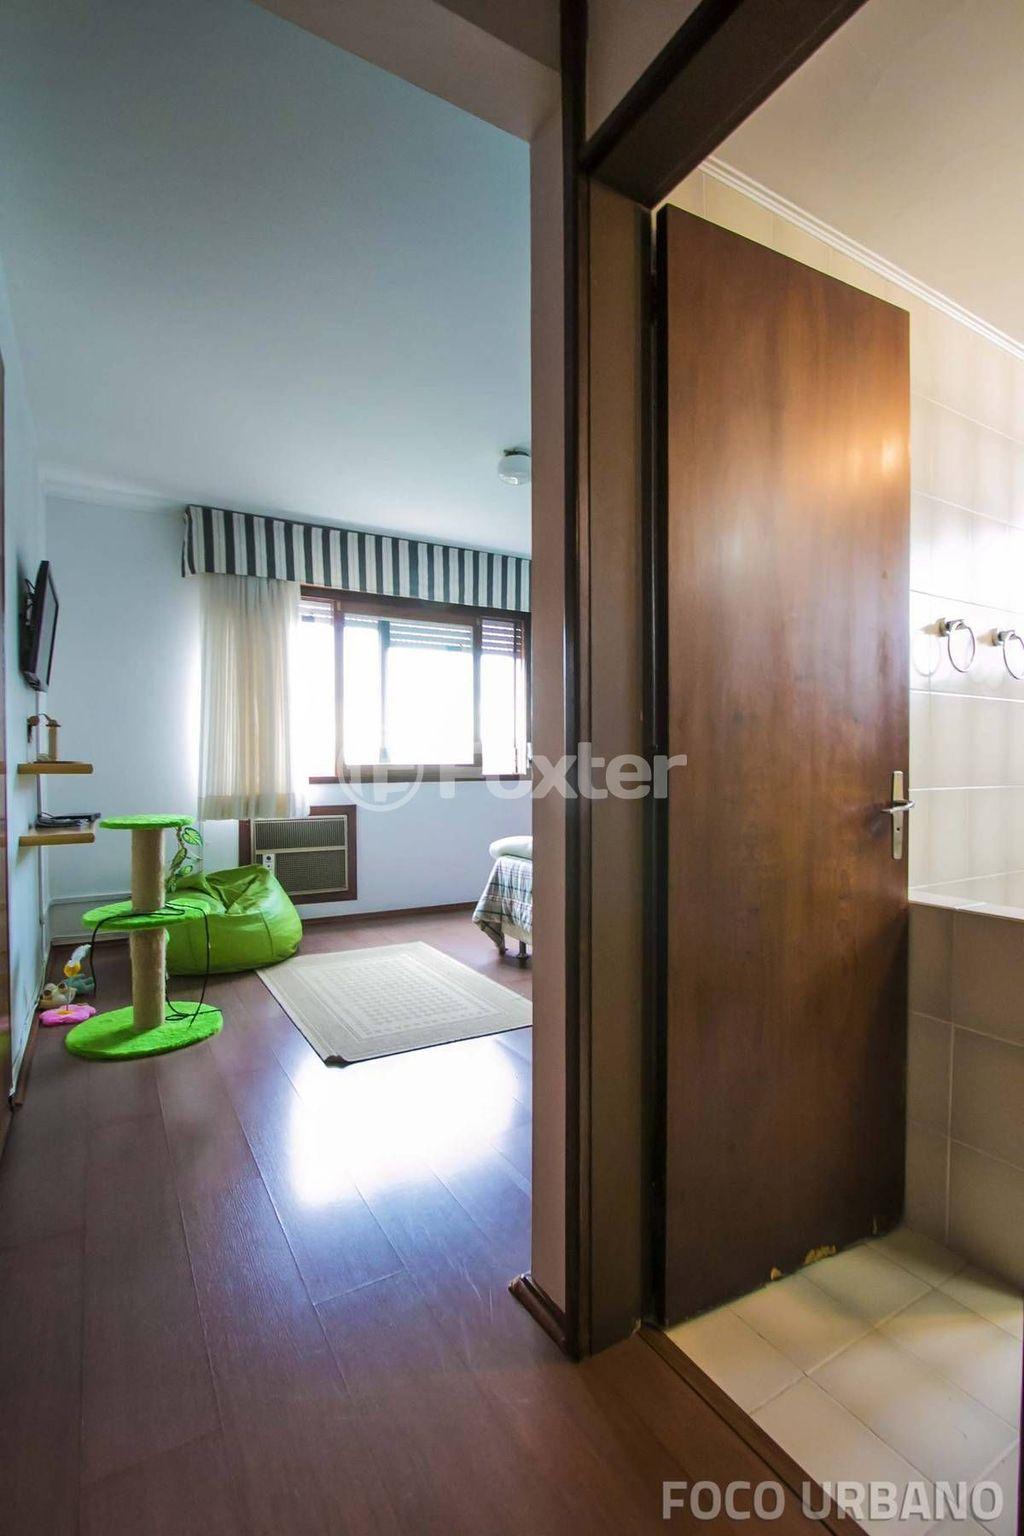 Apto 3 Dorm, Auxiliadora, Porto Alegre (124455) - Foto 18